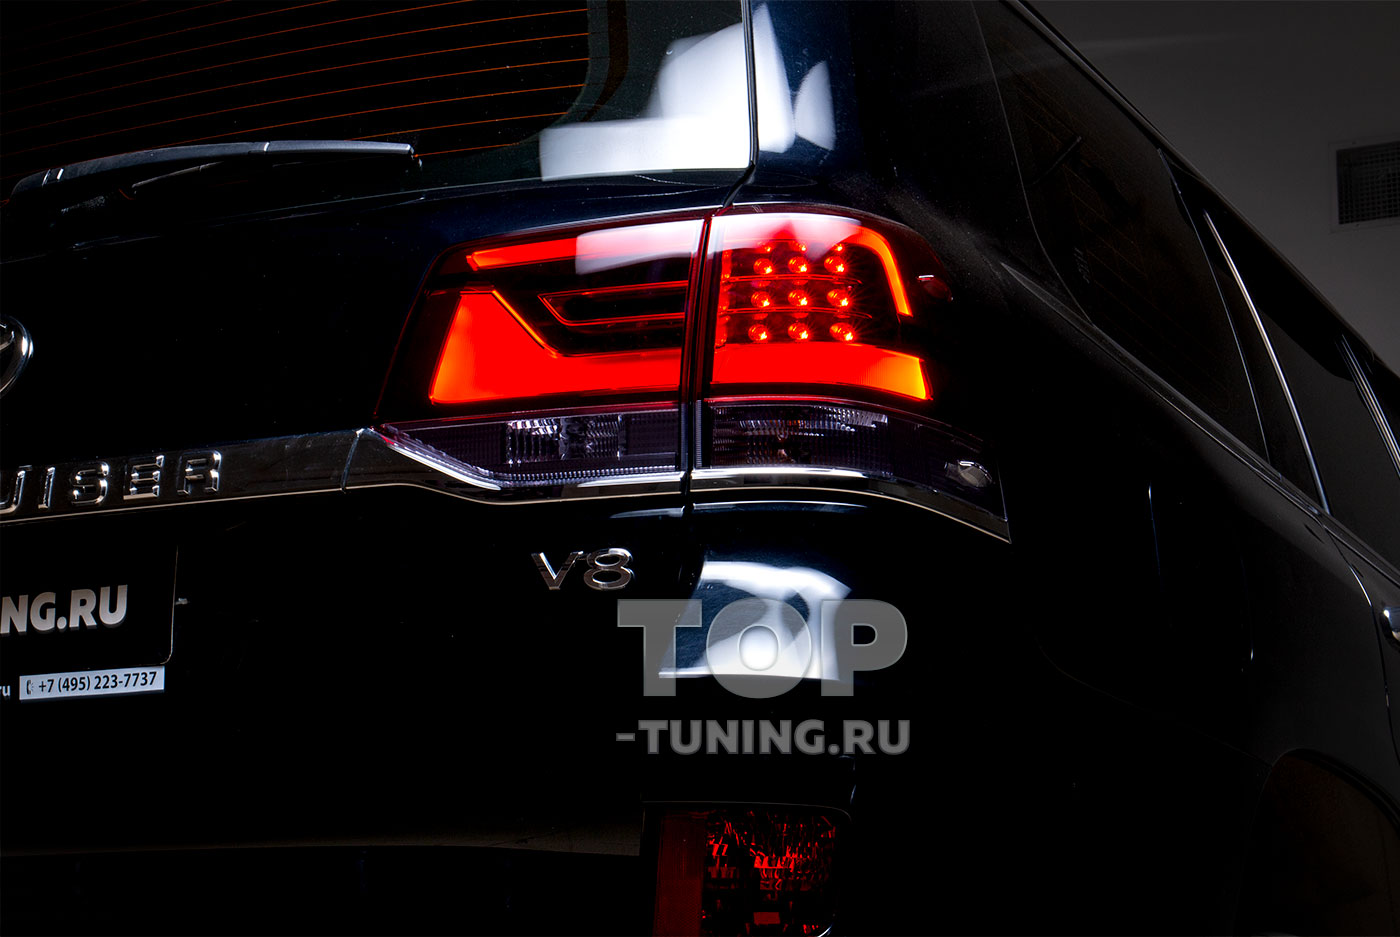 Установка обвеса, тонирование задних фонарей и чернение фар на TLC200